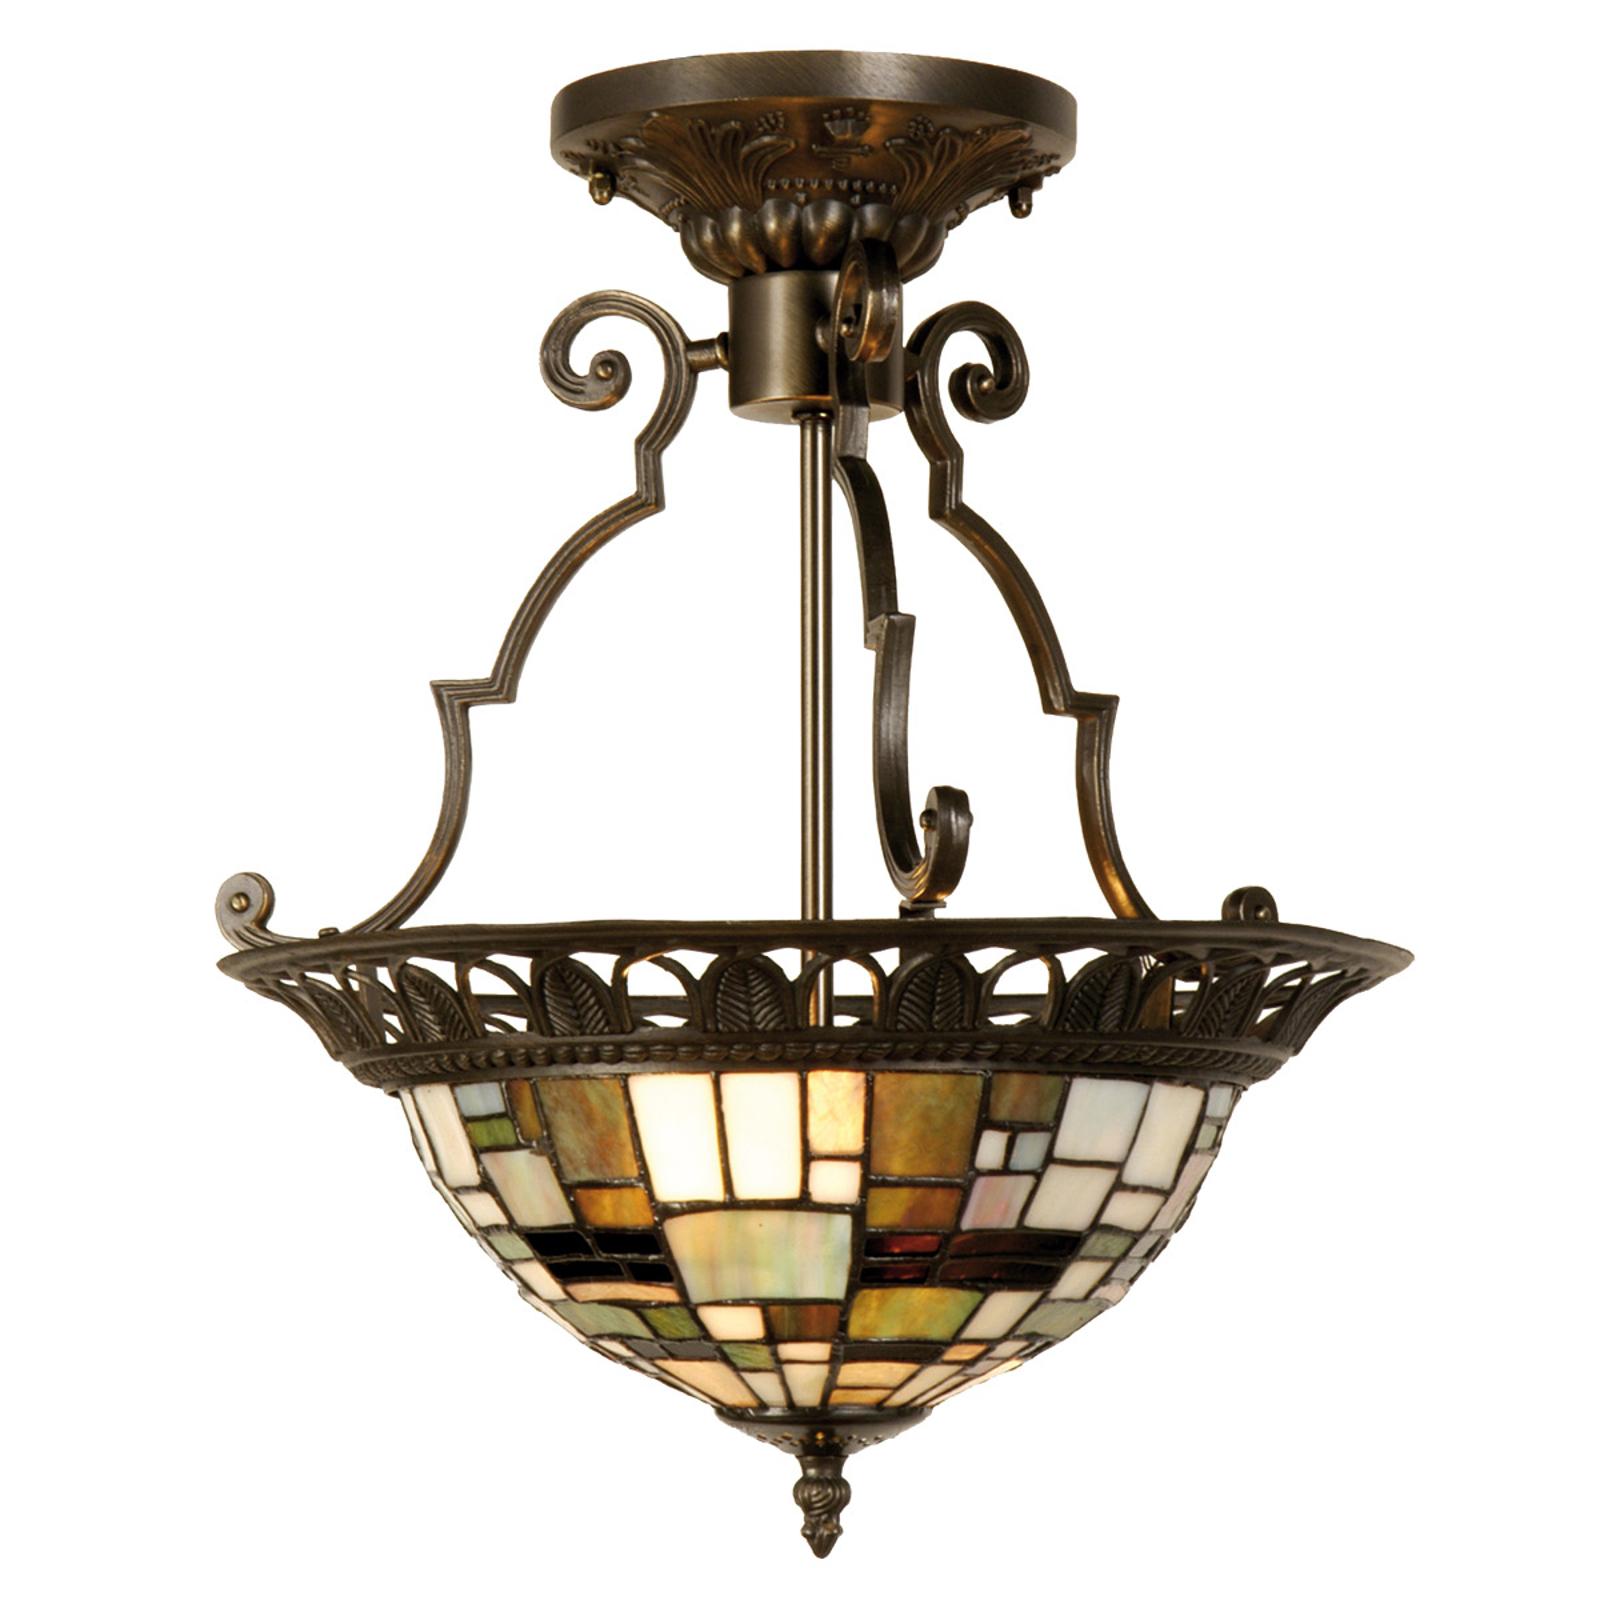 Villads - taklampe i Tiffany-stil